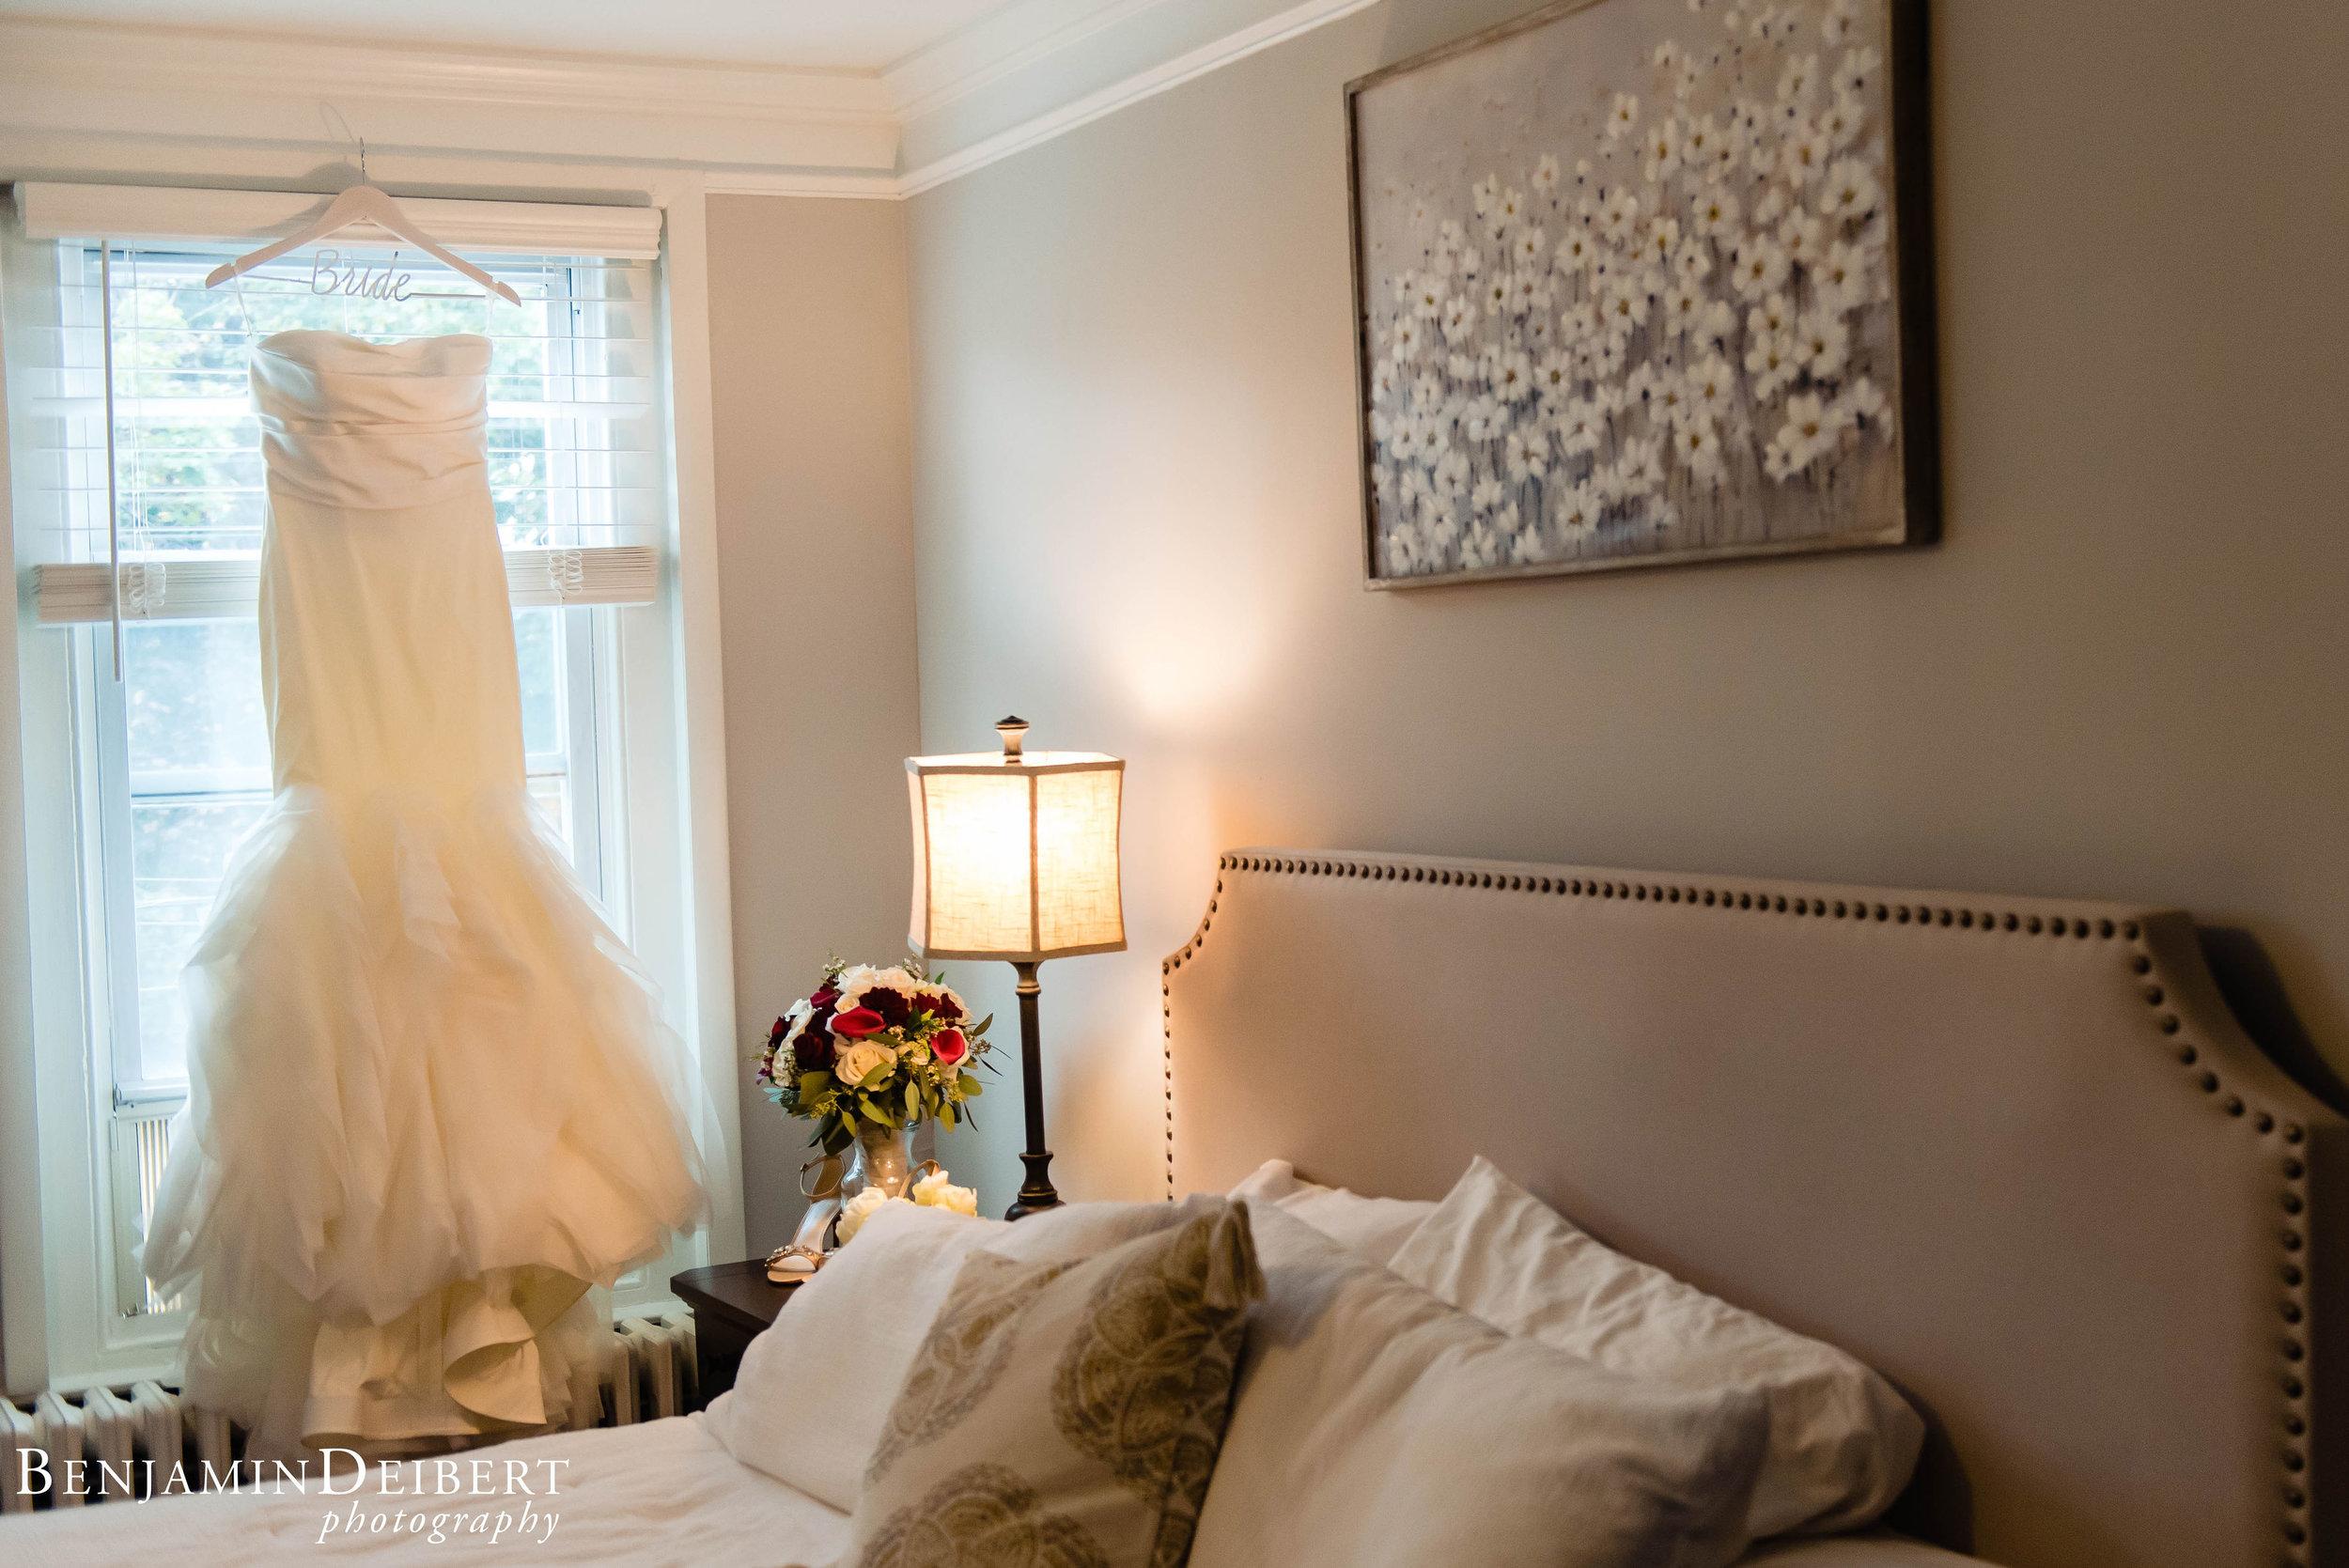 TeghanandChris_BridgemensBallroom_Wedding-22.jpg